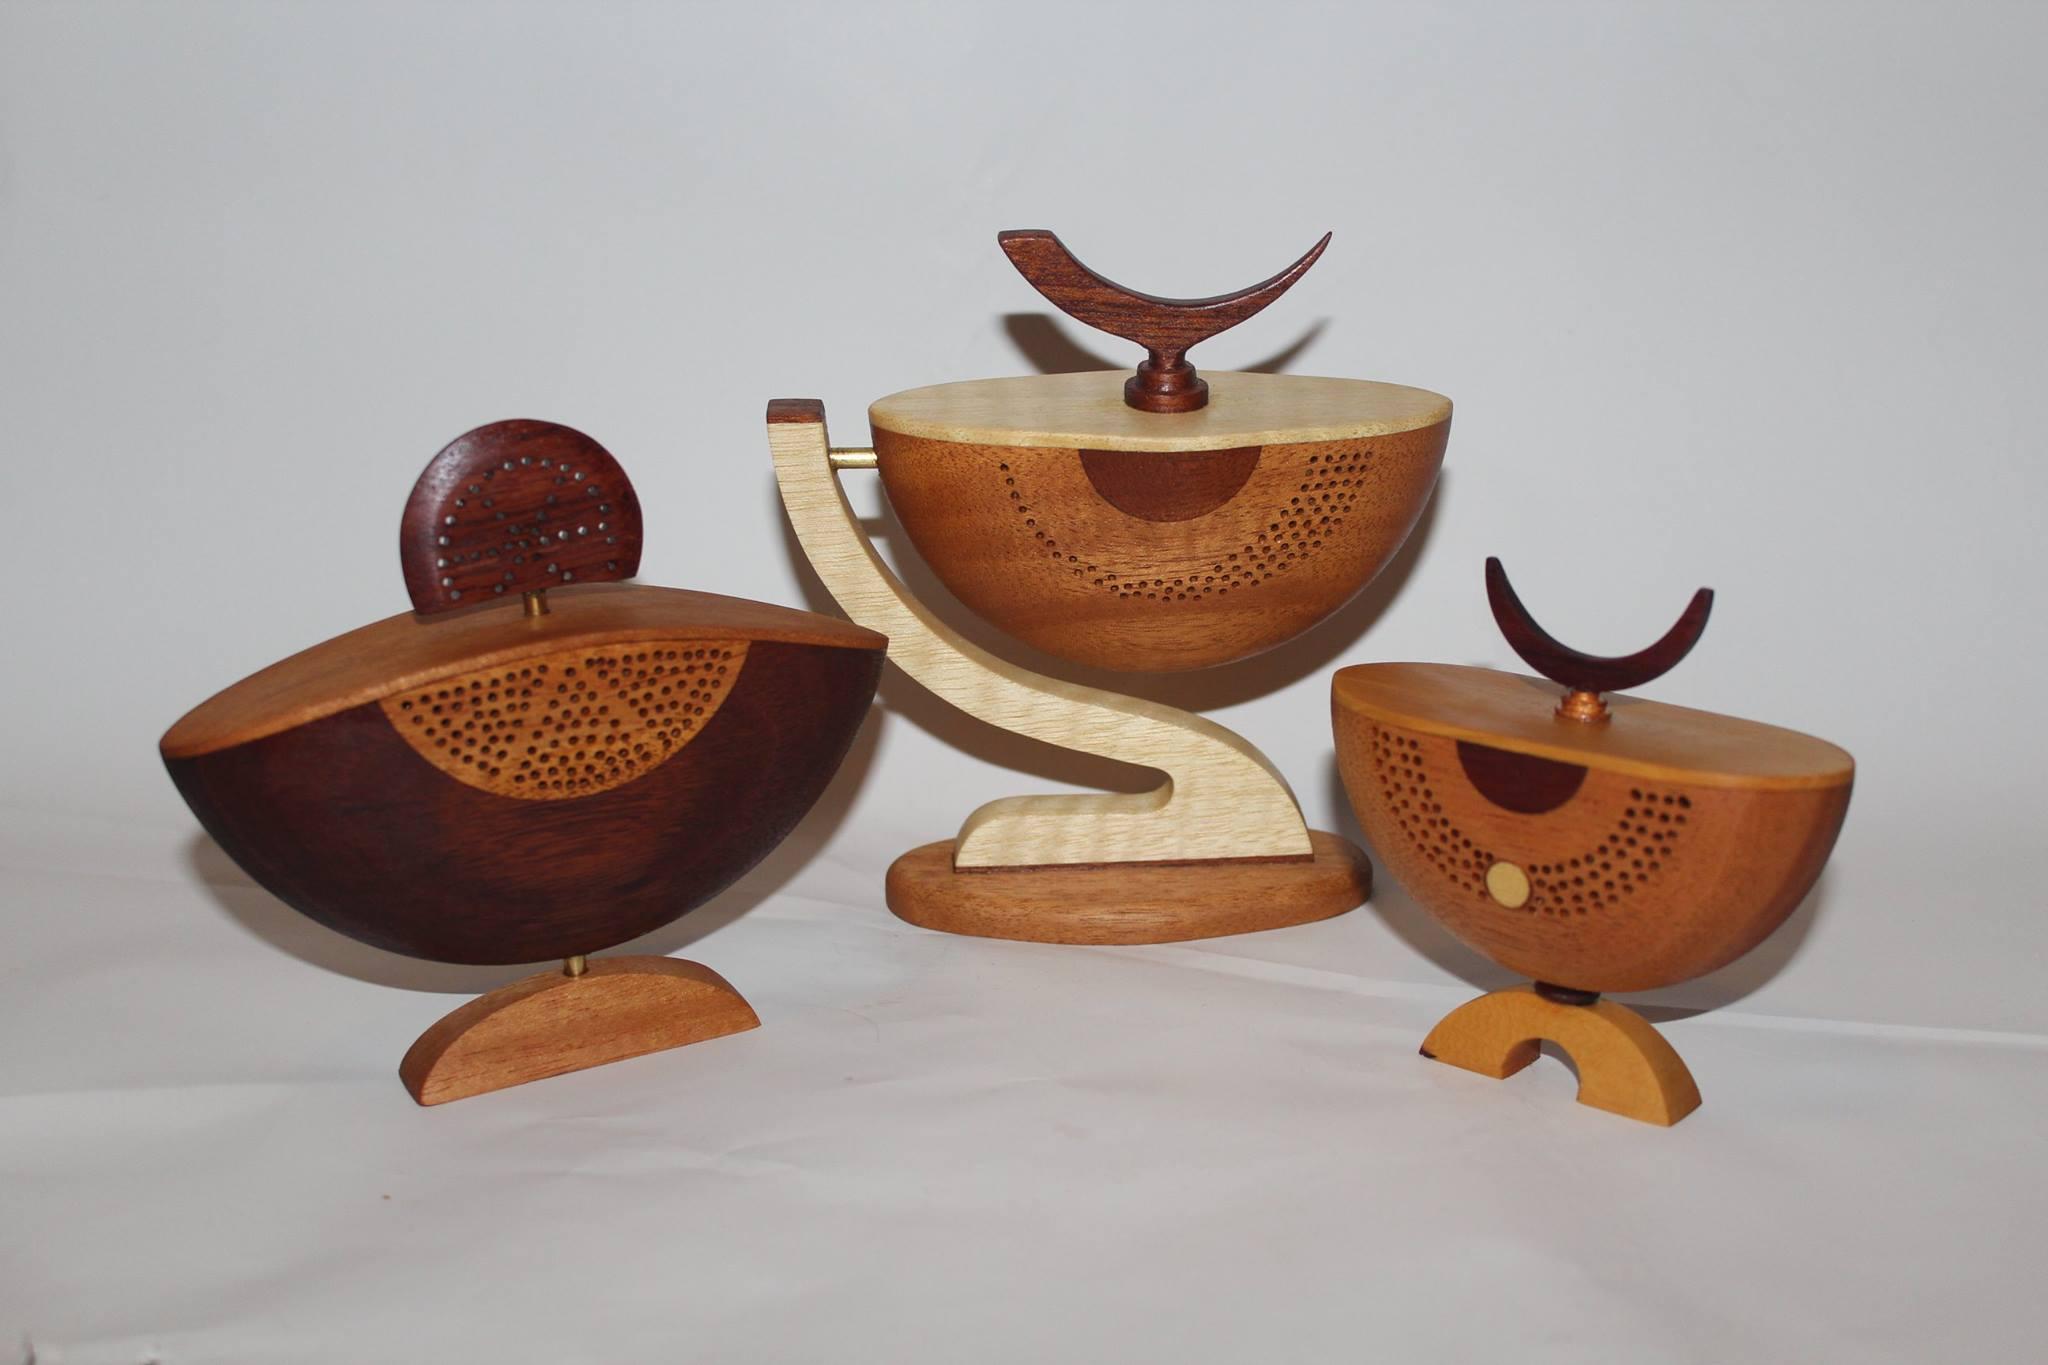 Split bowls